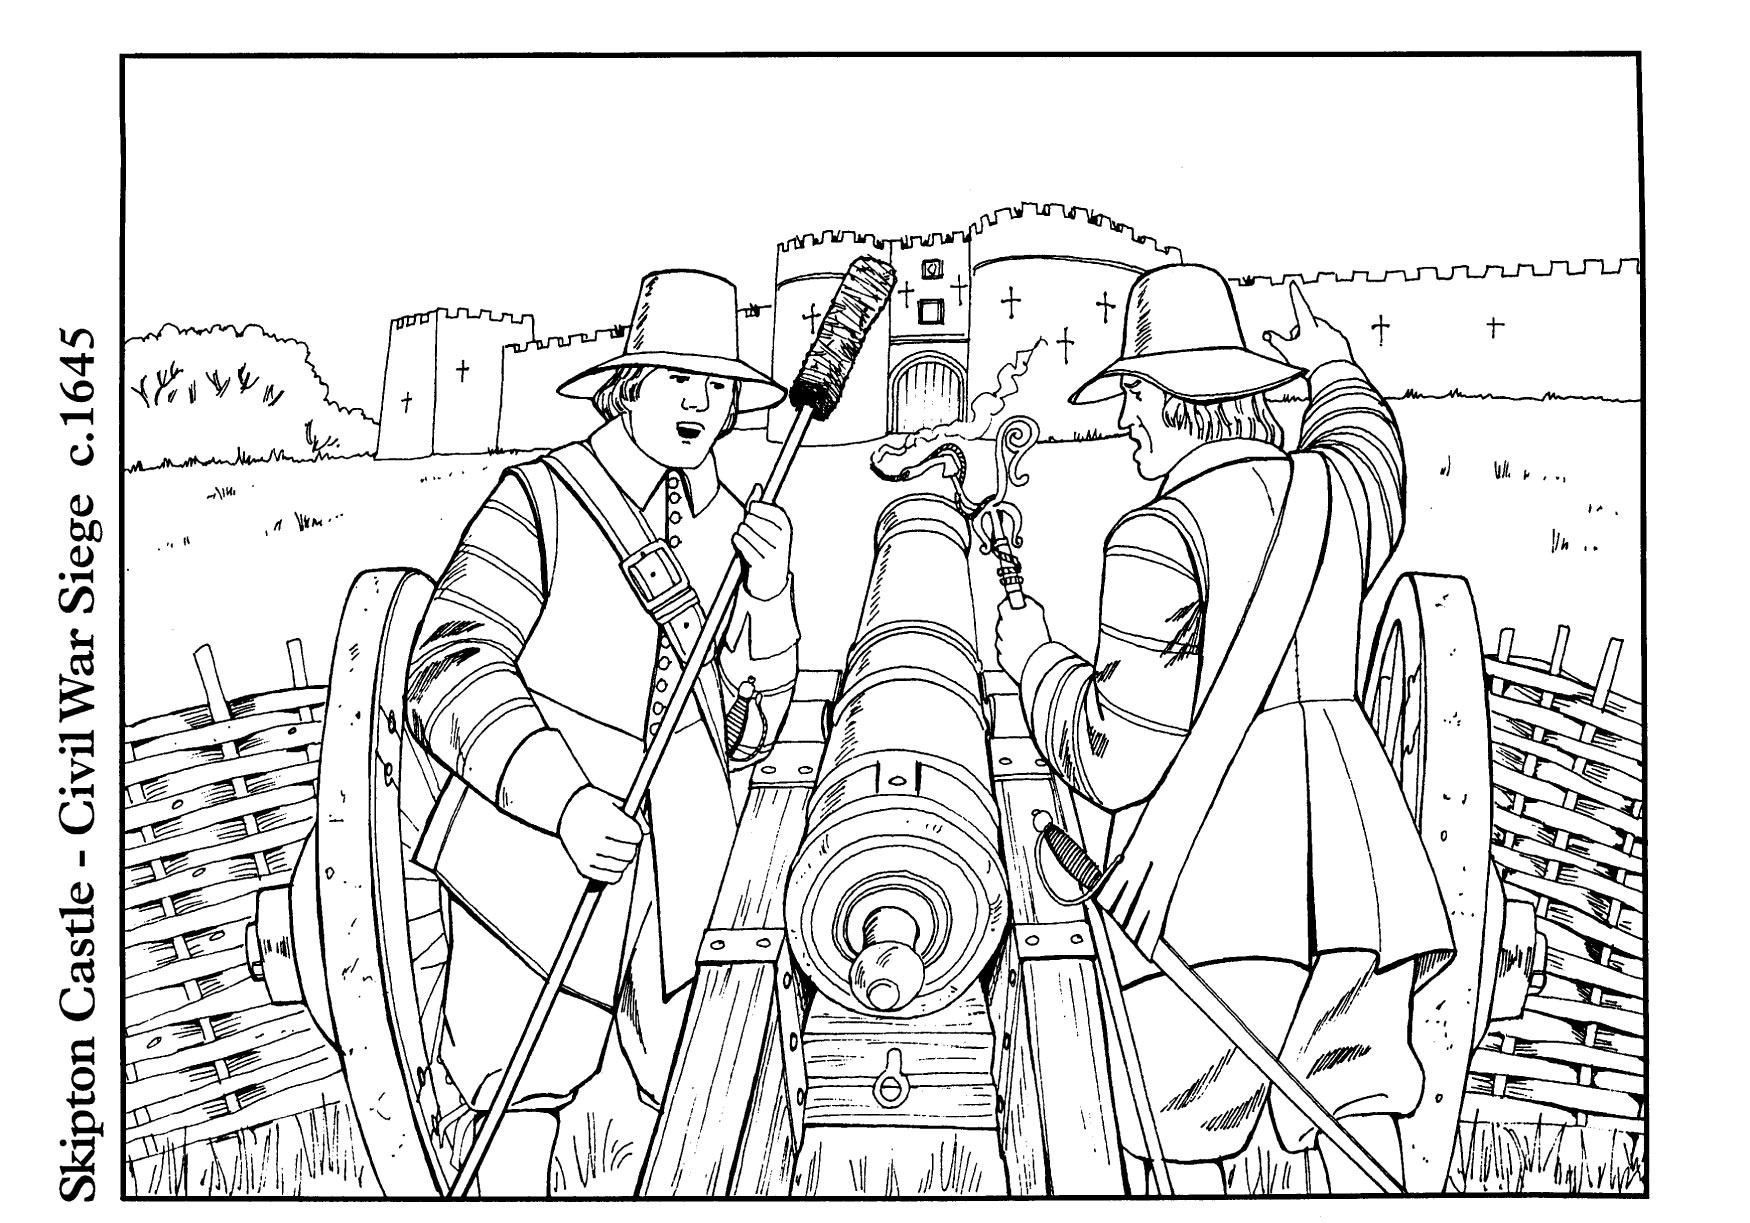 beautiful civil war uniforms coloring pages contemporary ... - Civil War Uniforms Coloring Pages